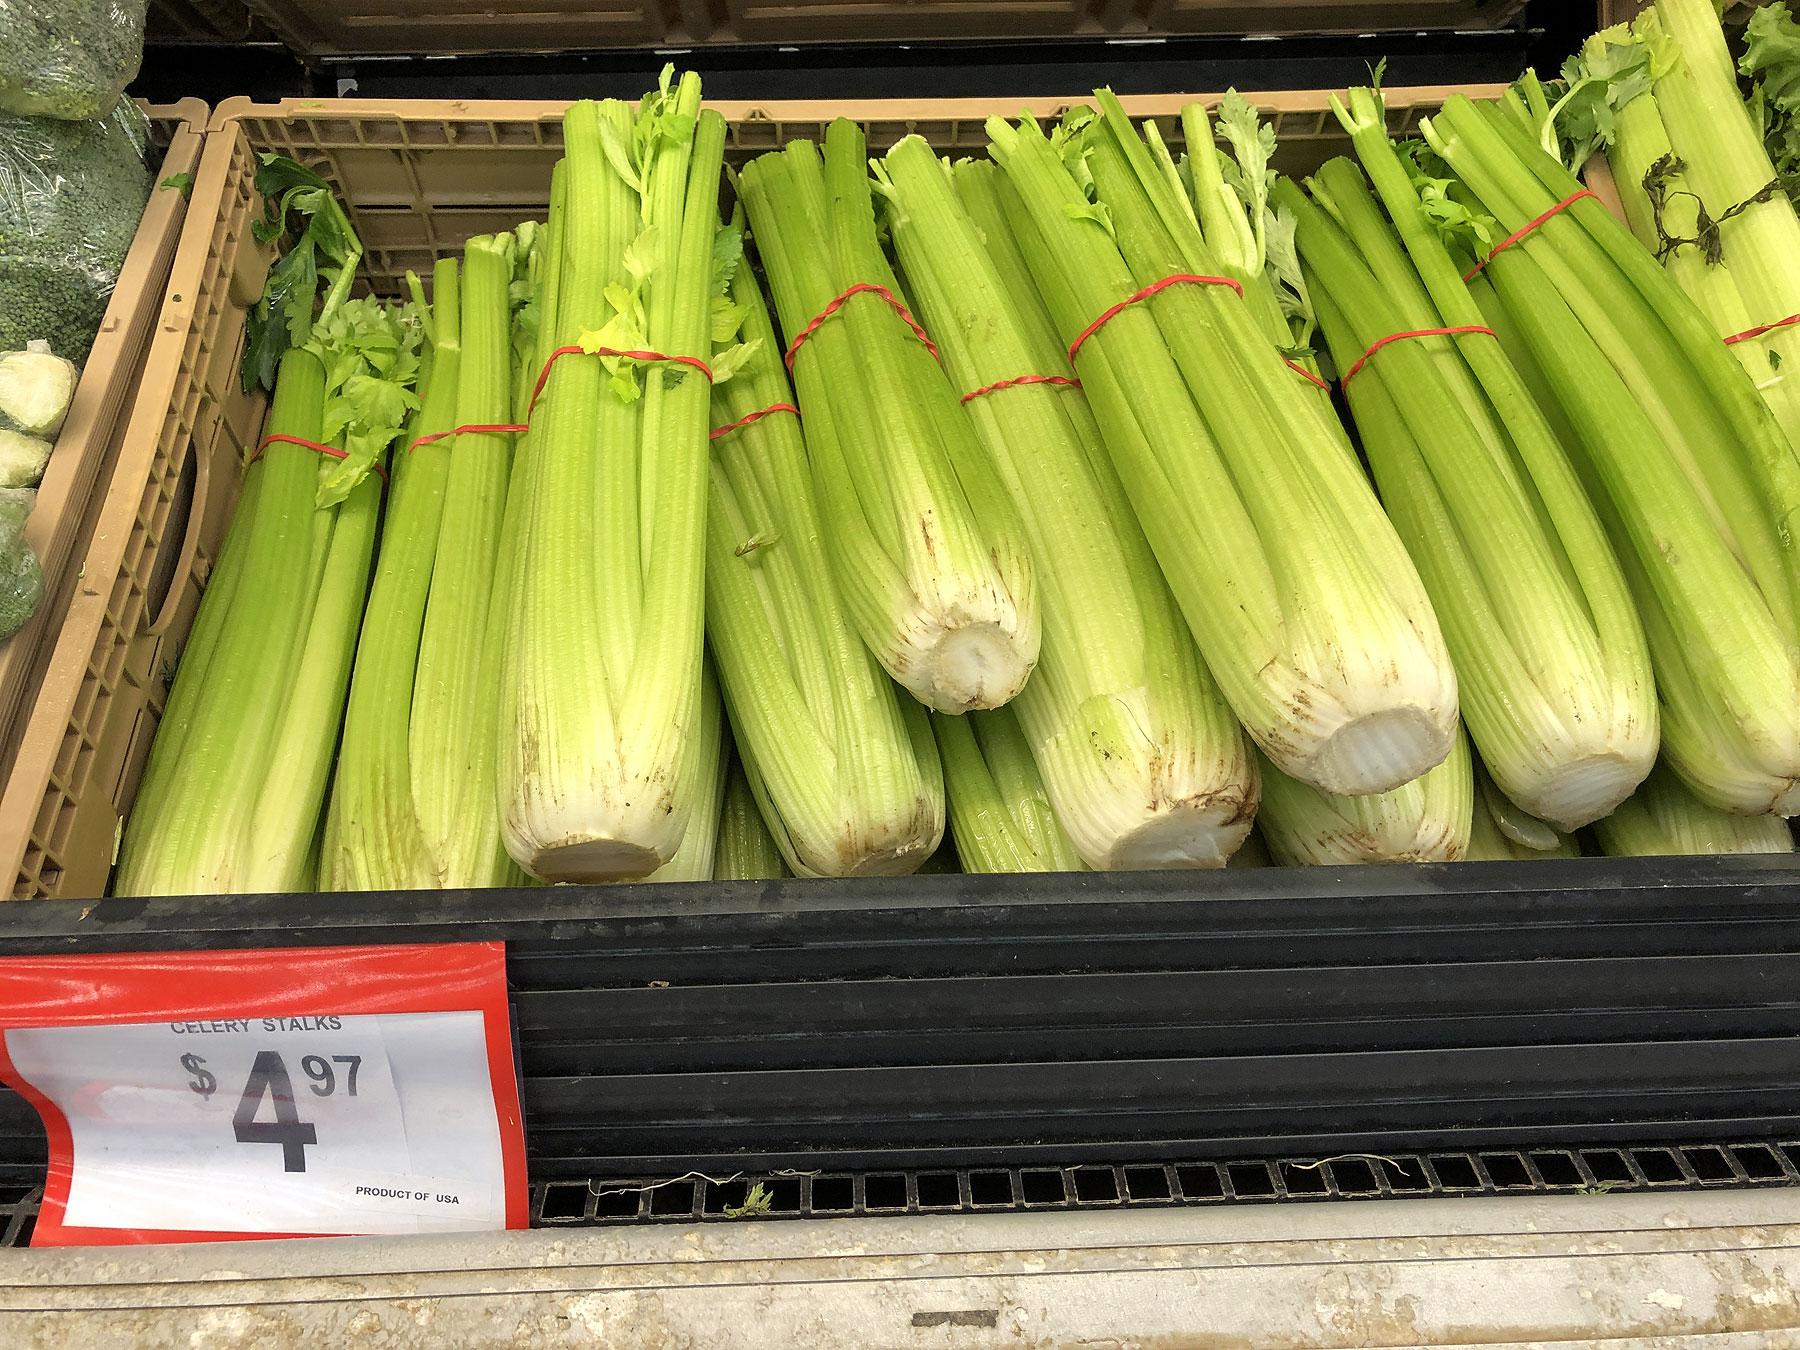 Celery in store